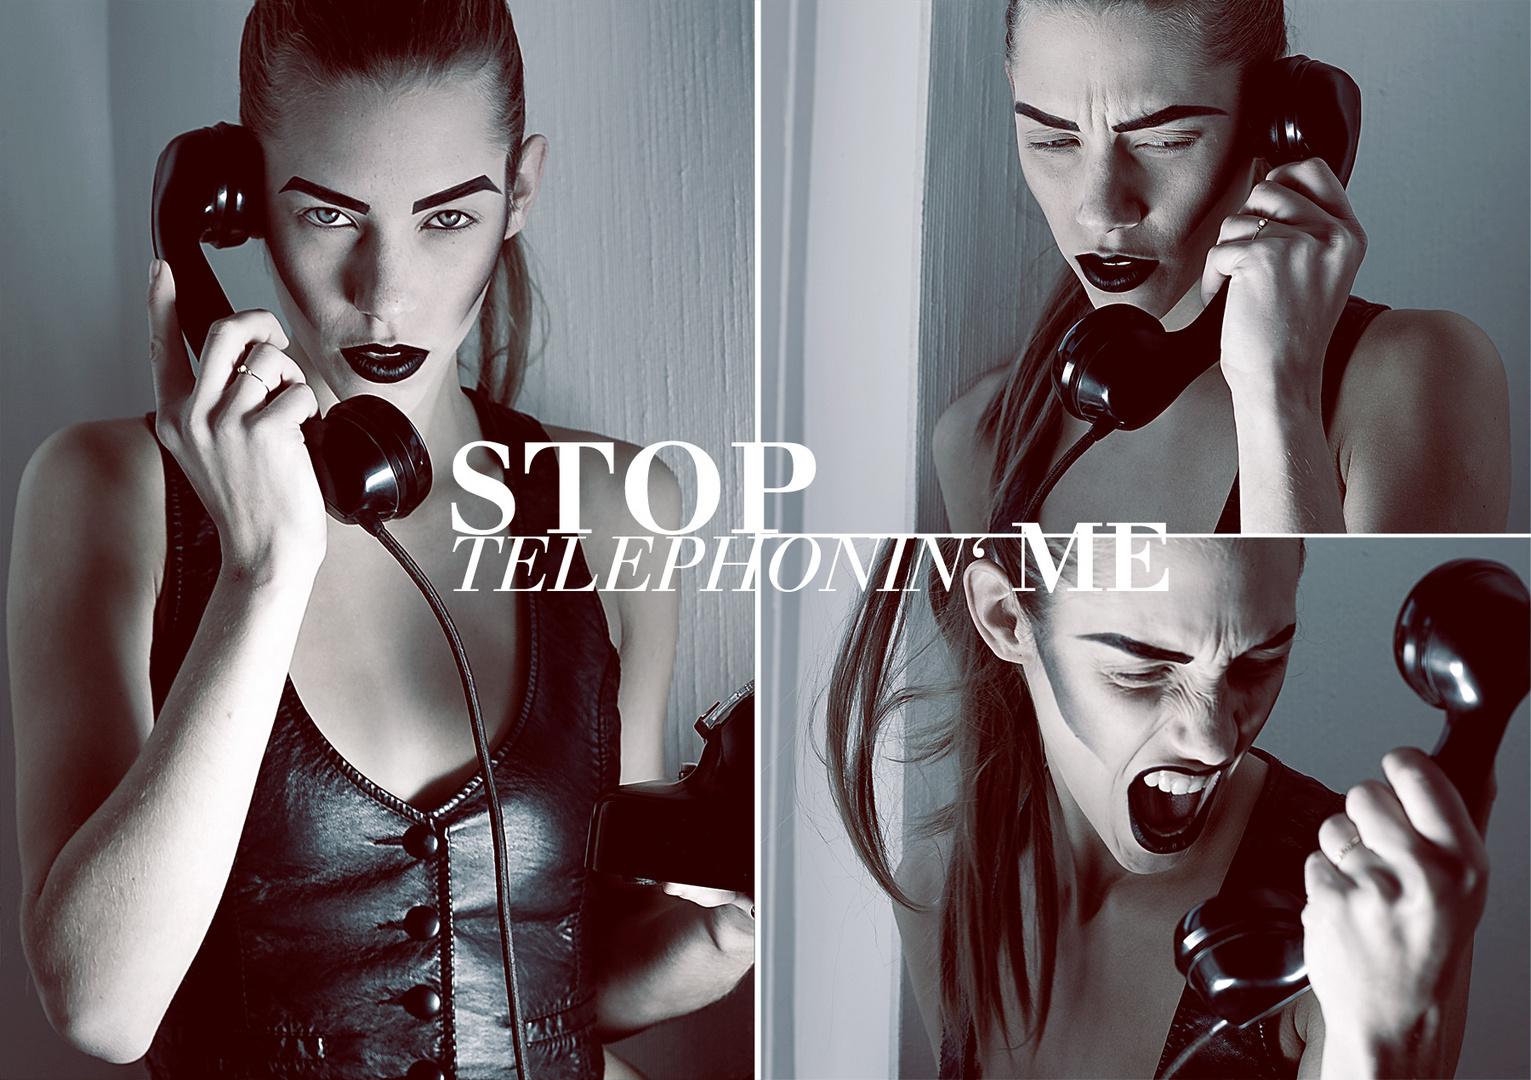 Stop telephonin' me